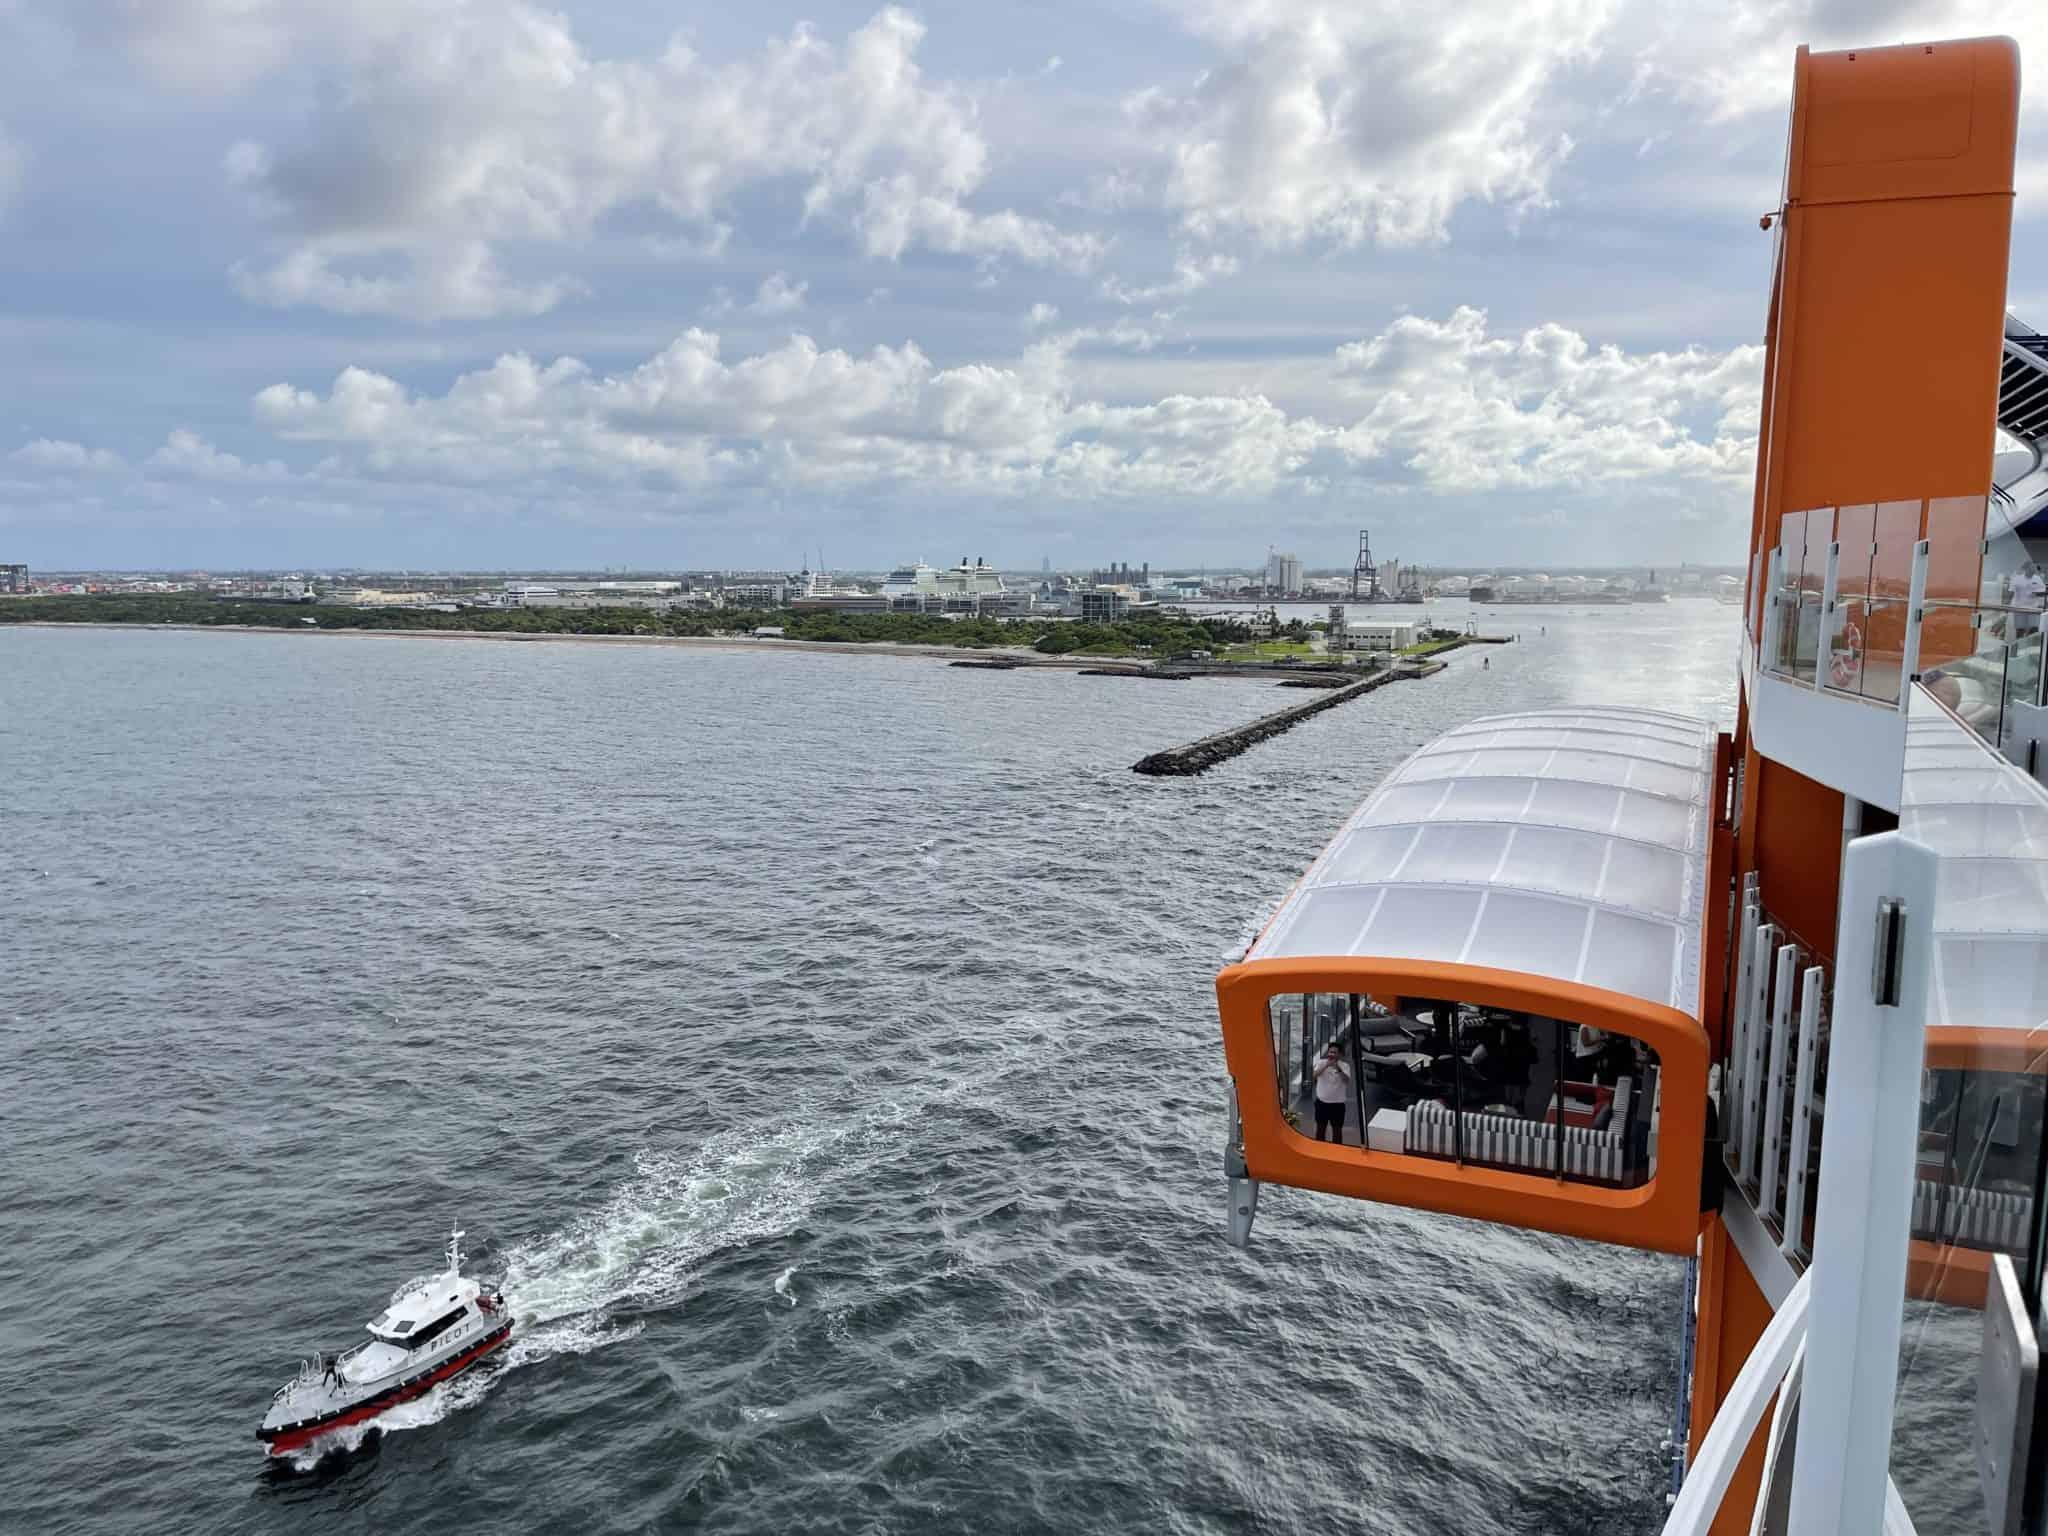 pilot boat everglades celebrity edge